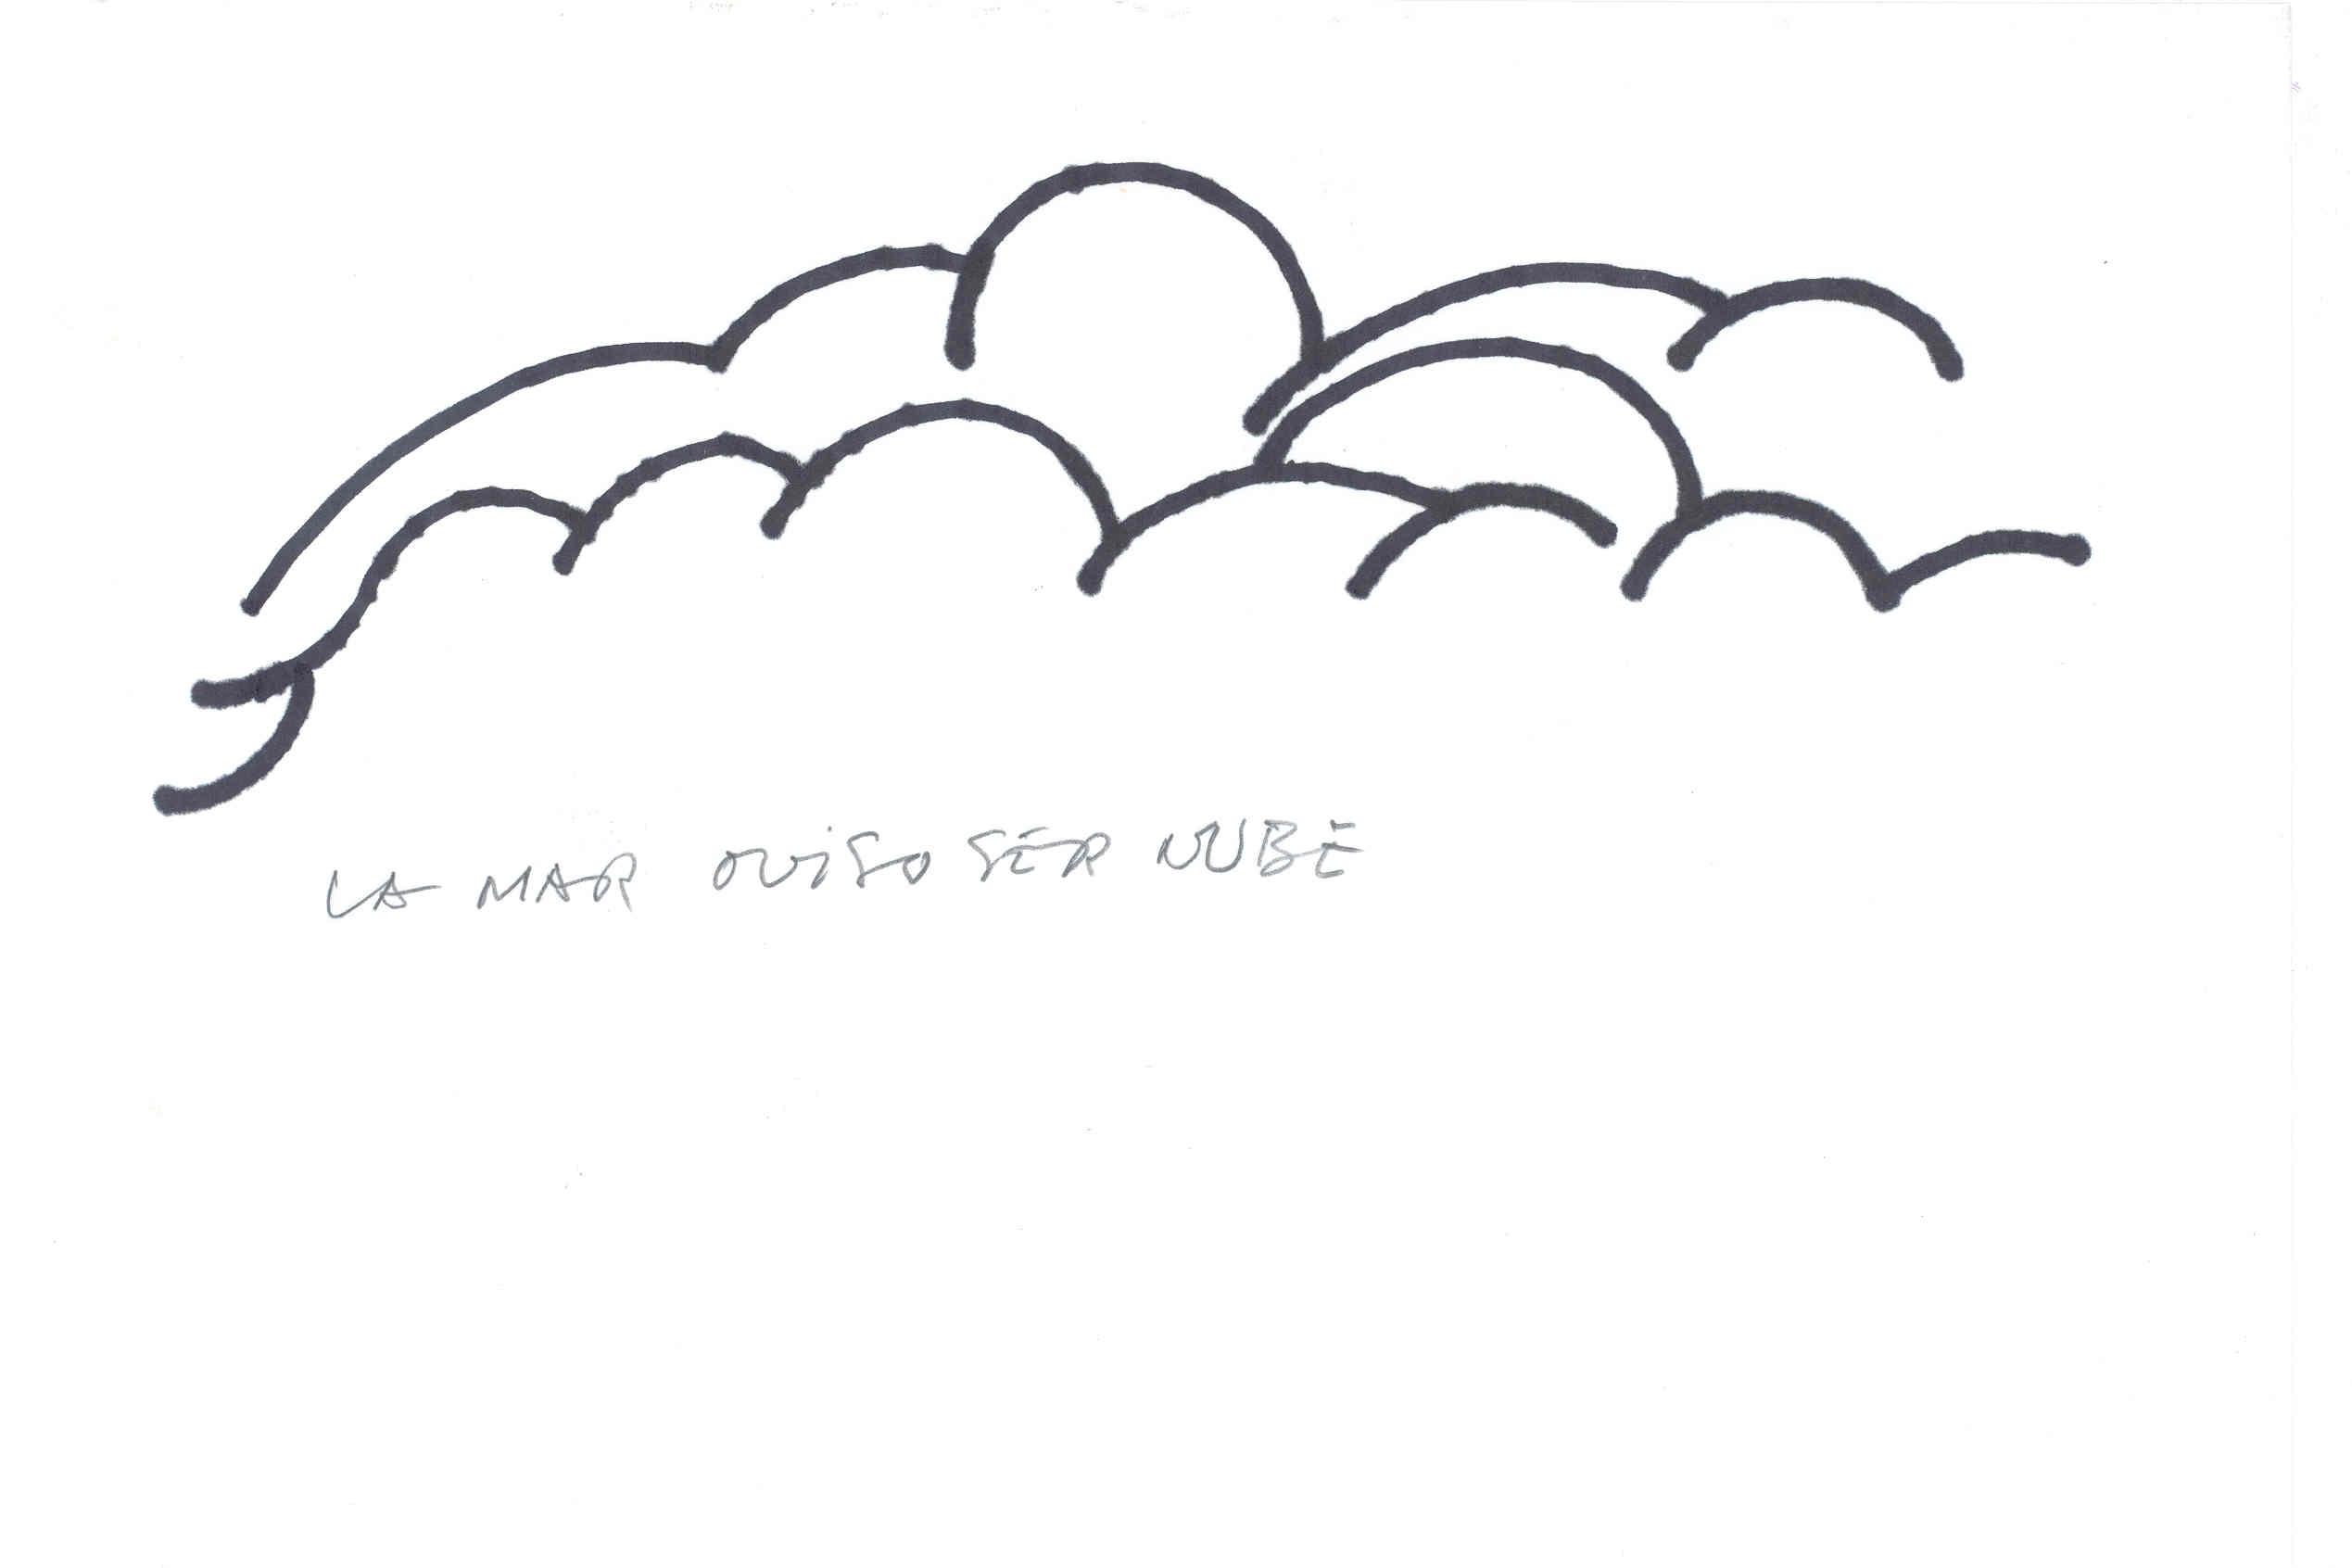 DIbujo de Nubes de Chillida